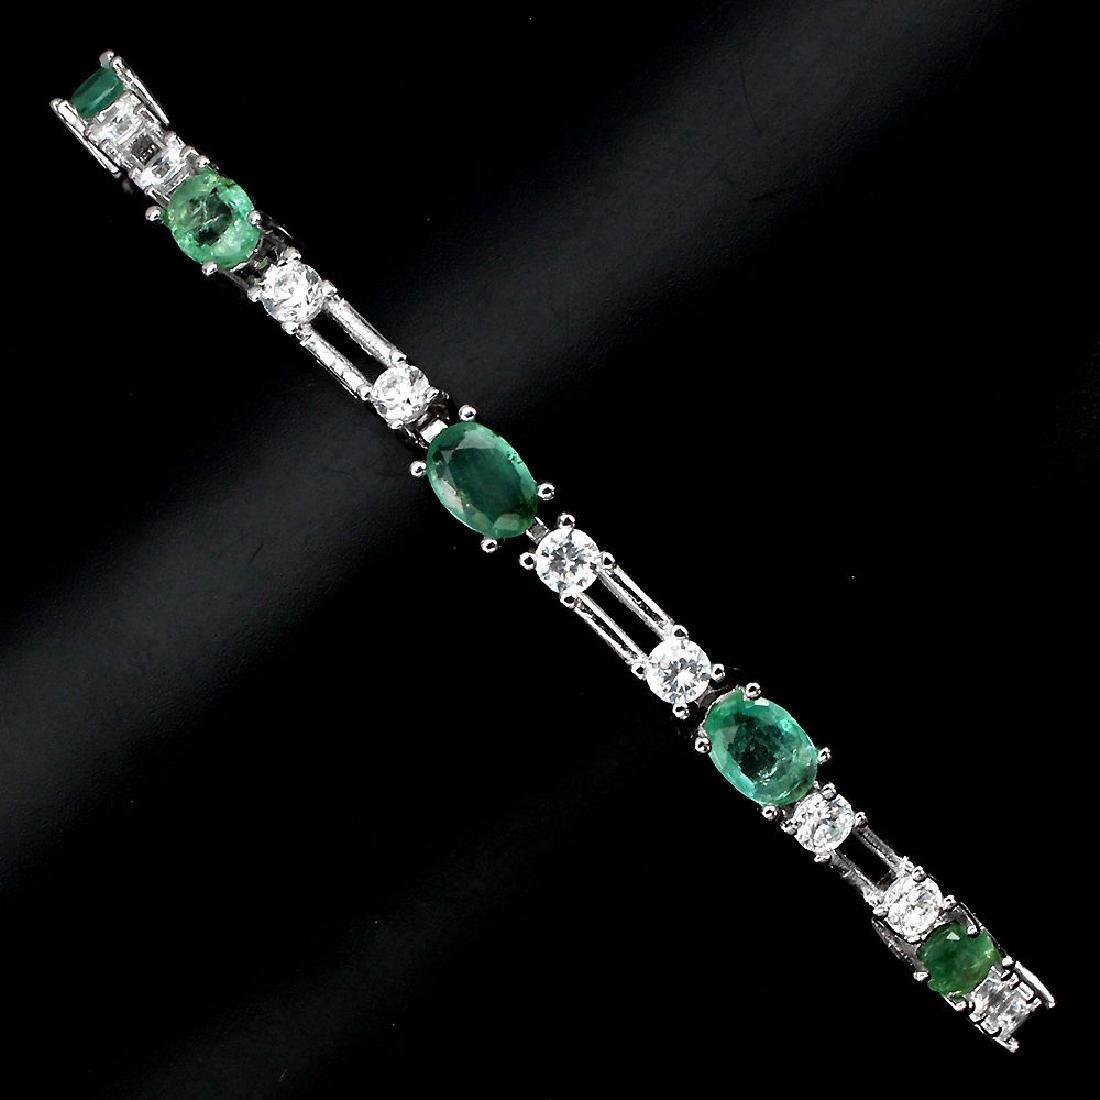 Natural Green Emerald 58.28 Carats Bracelet